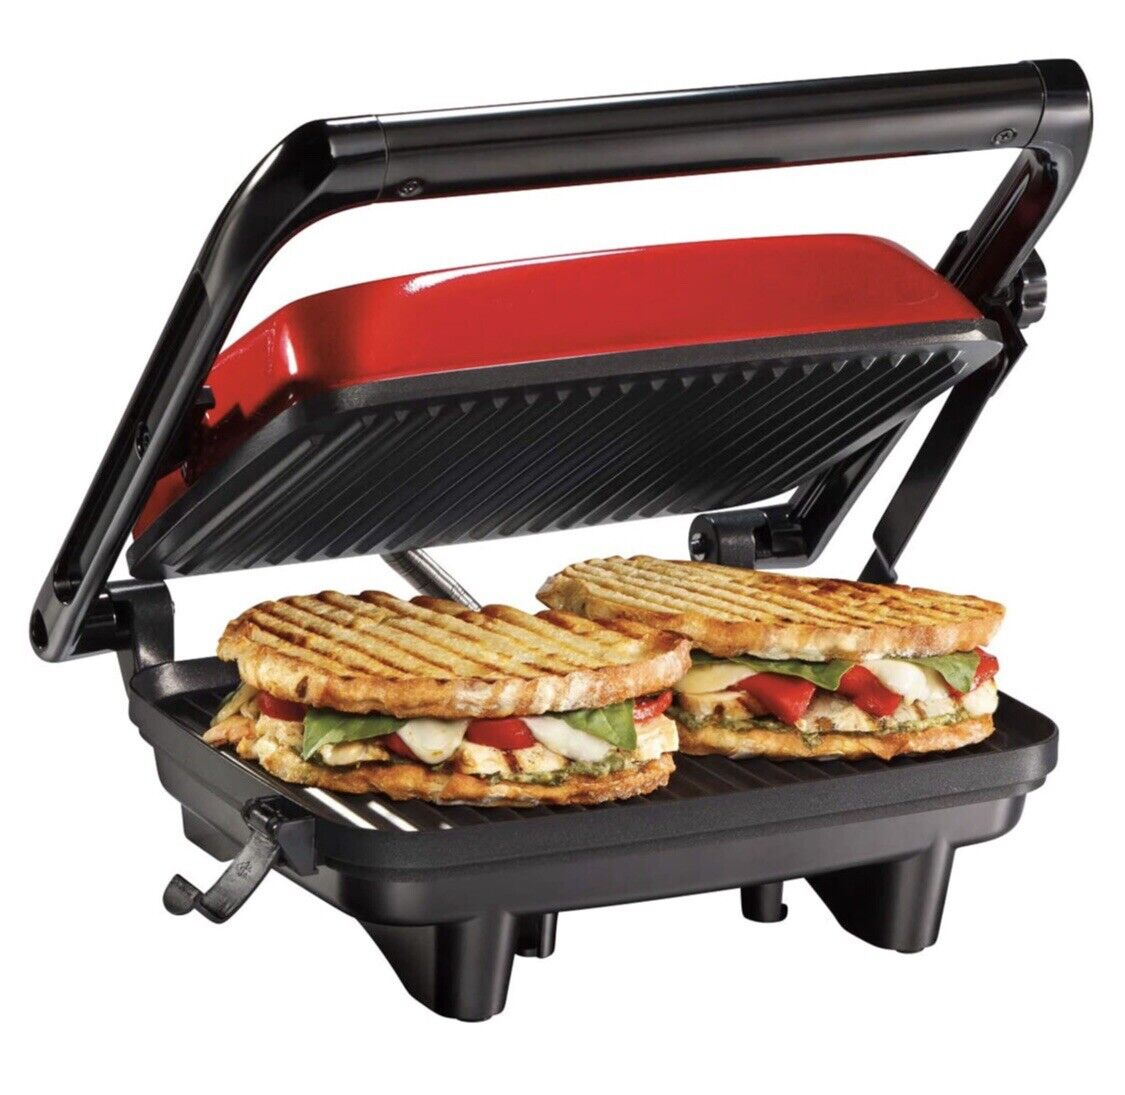 Hamilton Beach Panini Press Gourmet Sandwich Maker, Red, 254